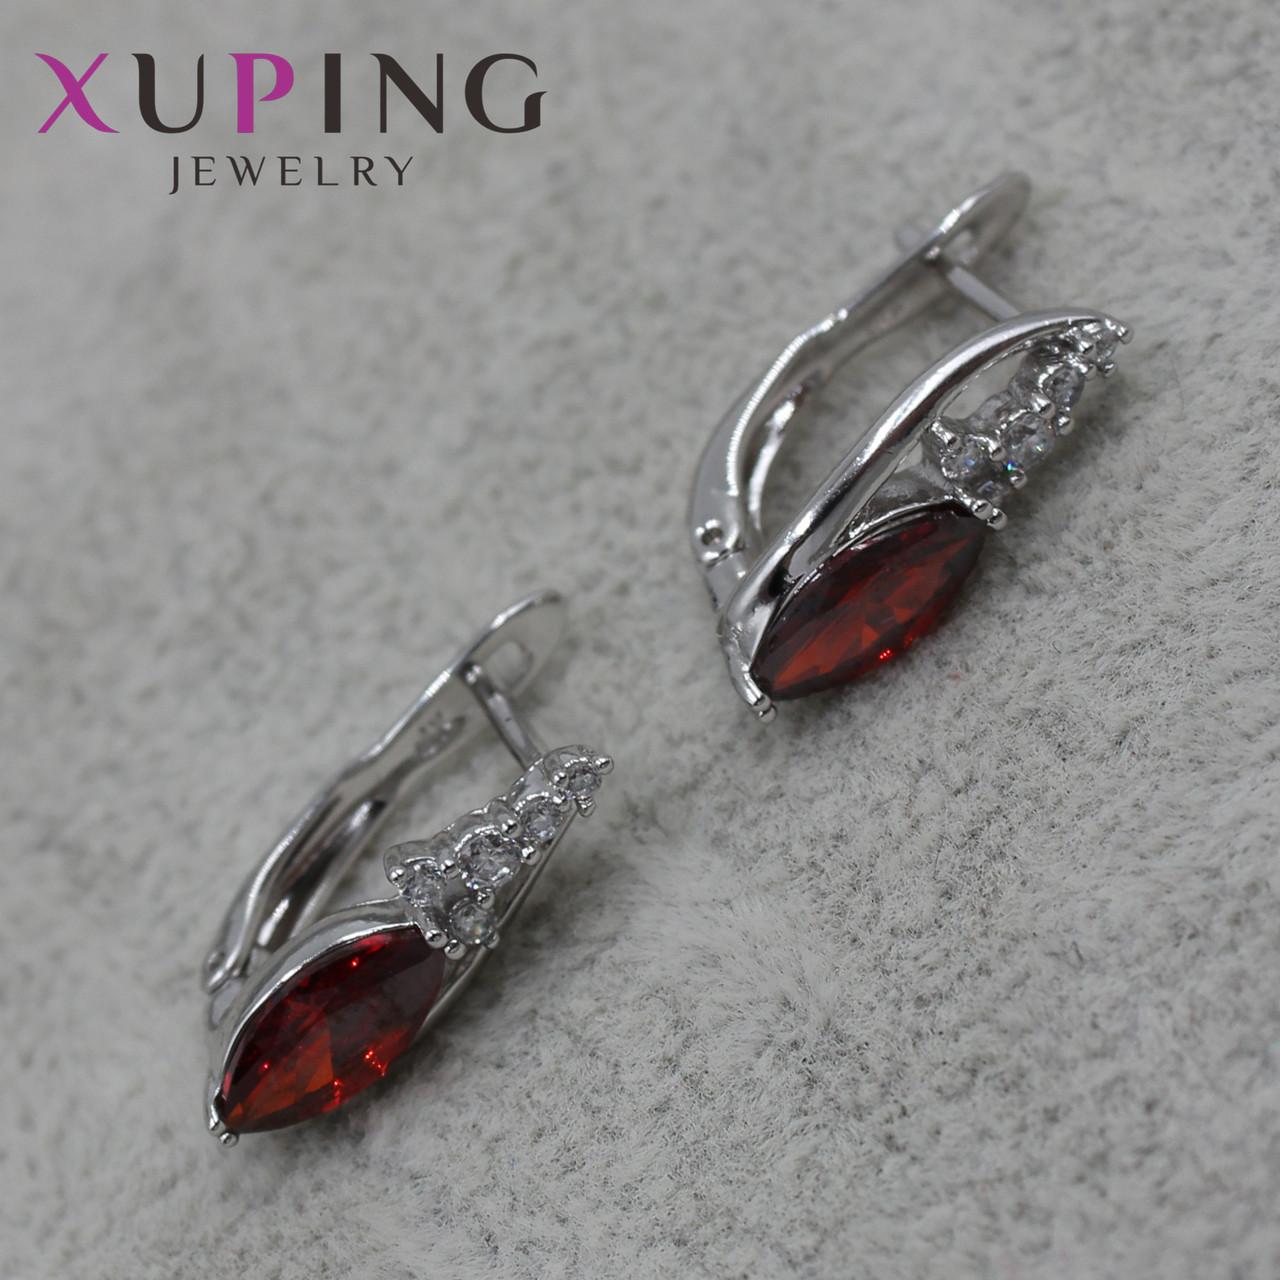 Серьги женские Xuping Jewelry медицинское золото - 1110722592